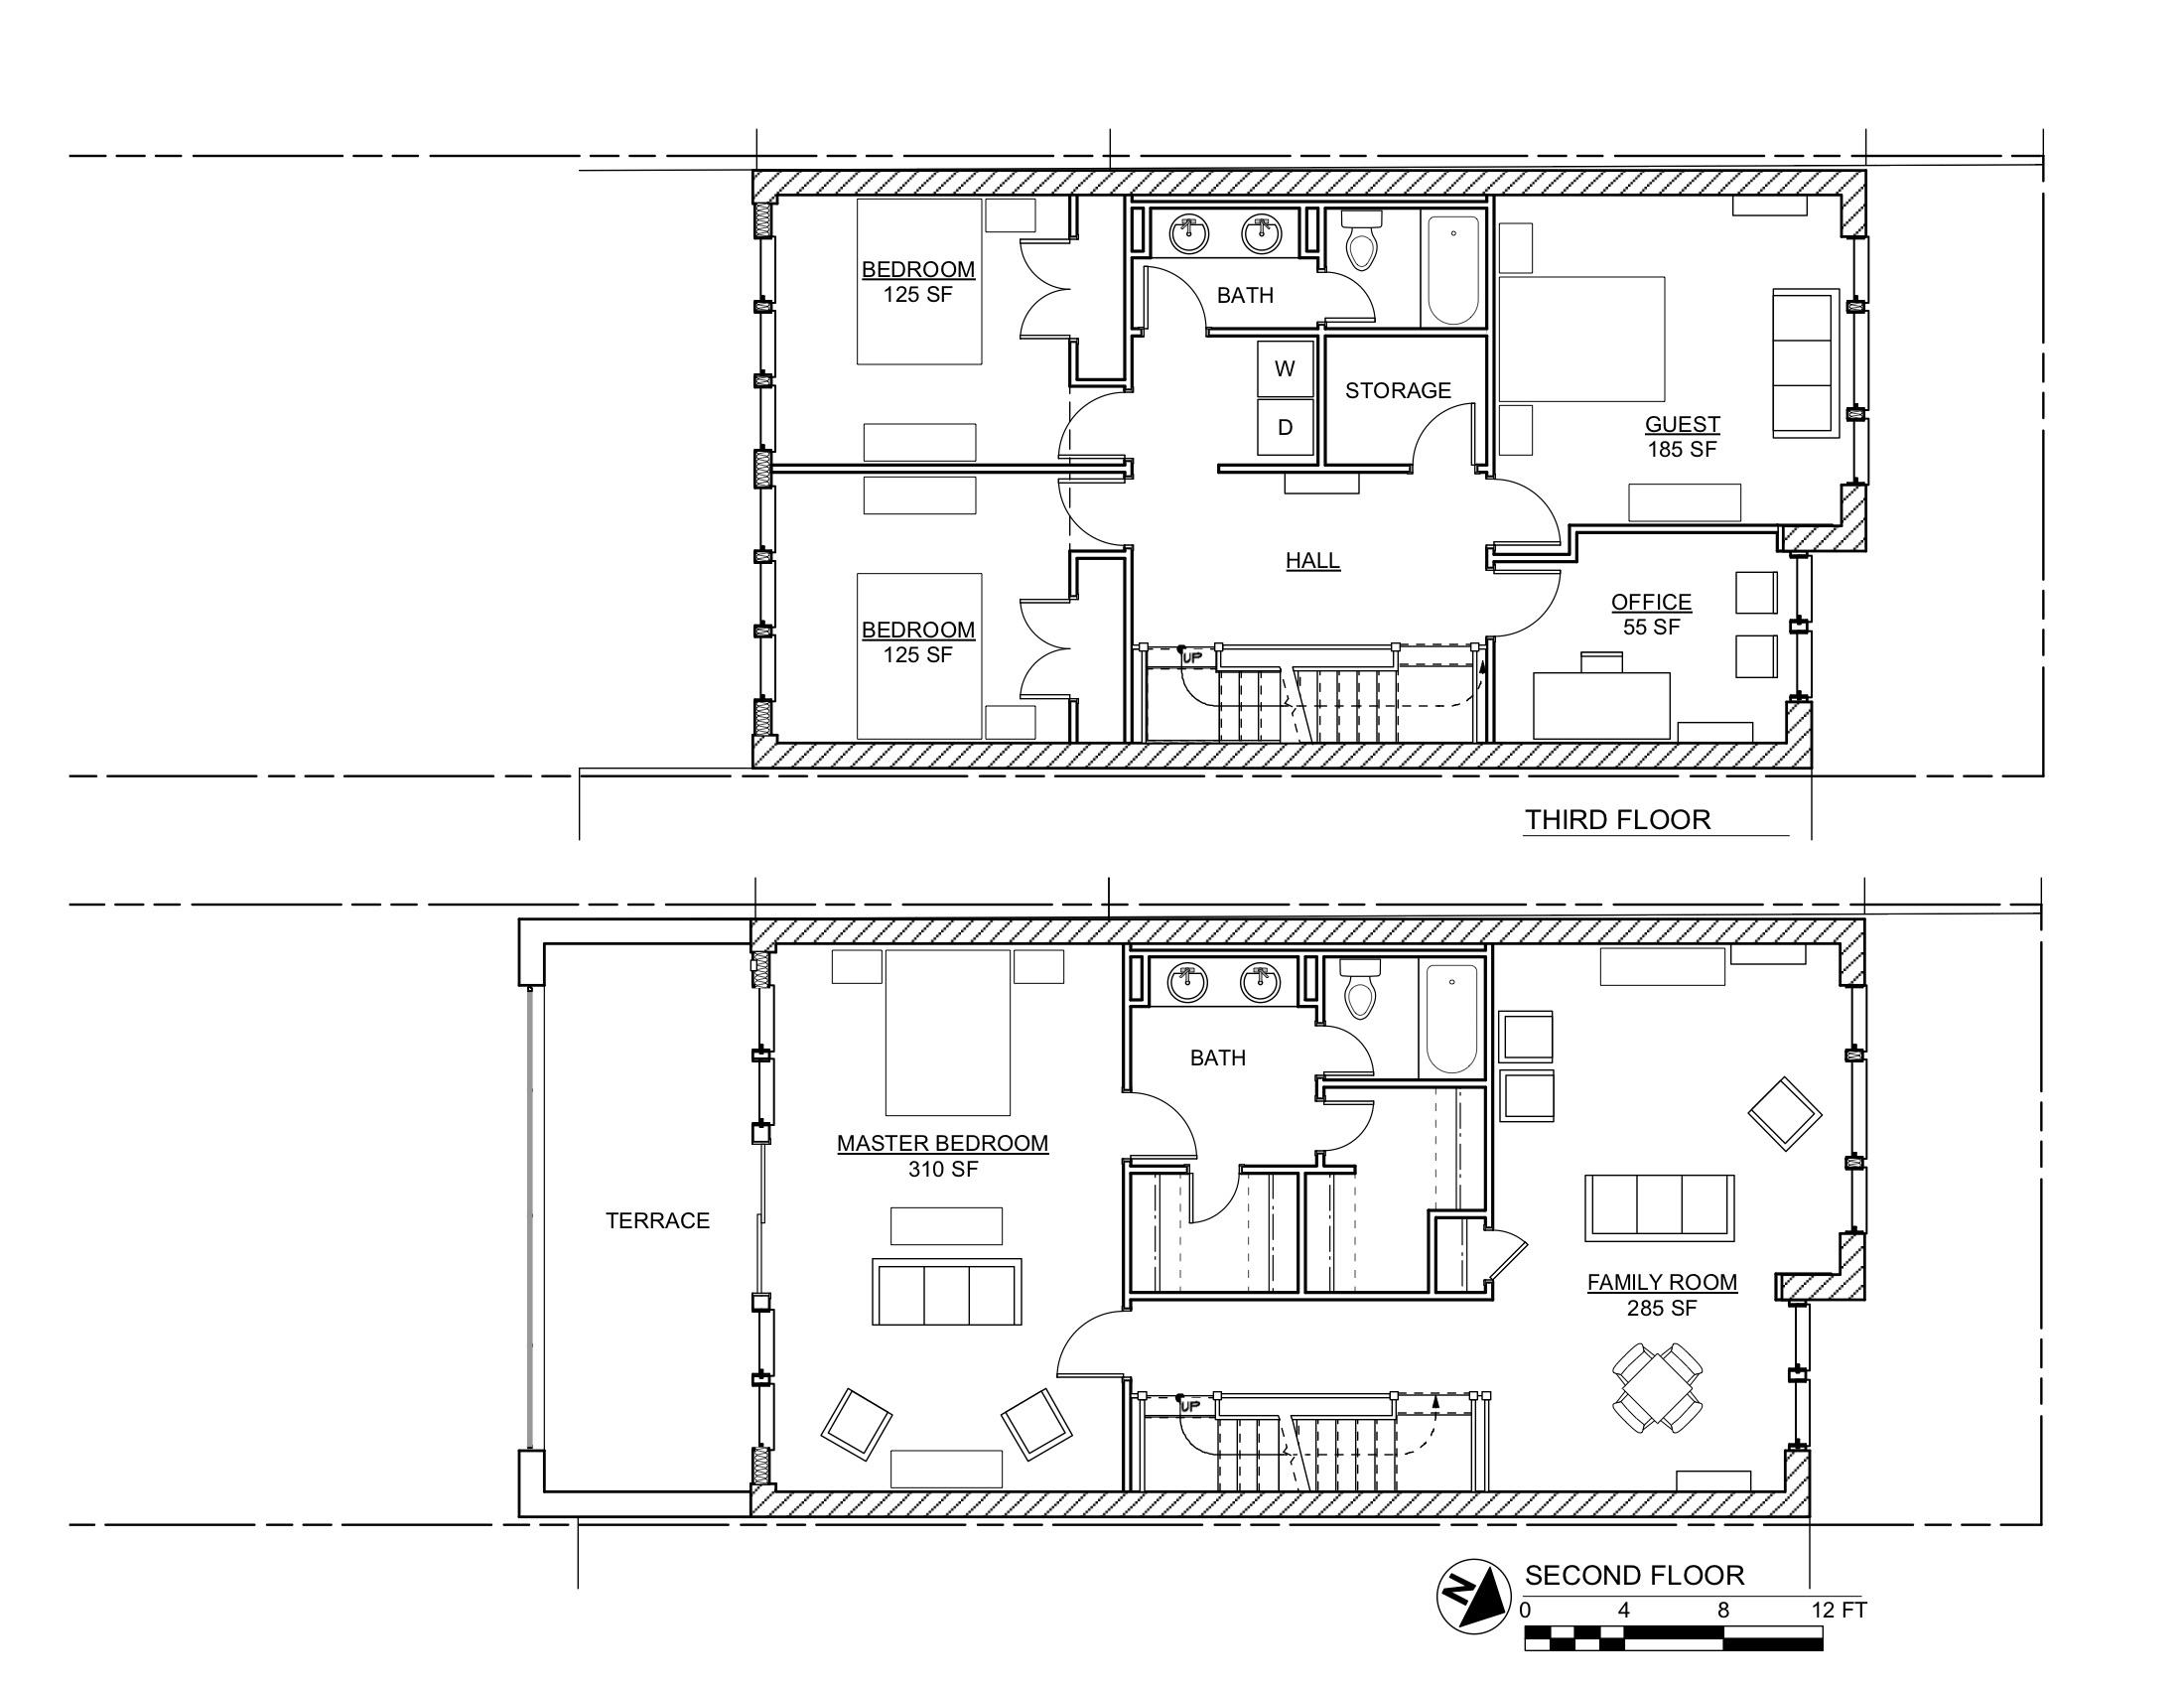 REEVE PLANS 2ND & 3RD FLOORS